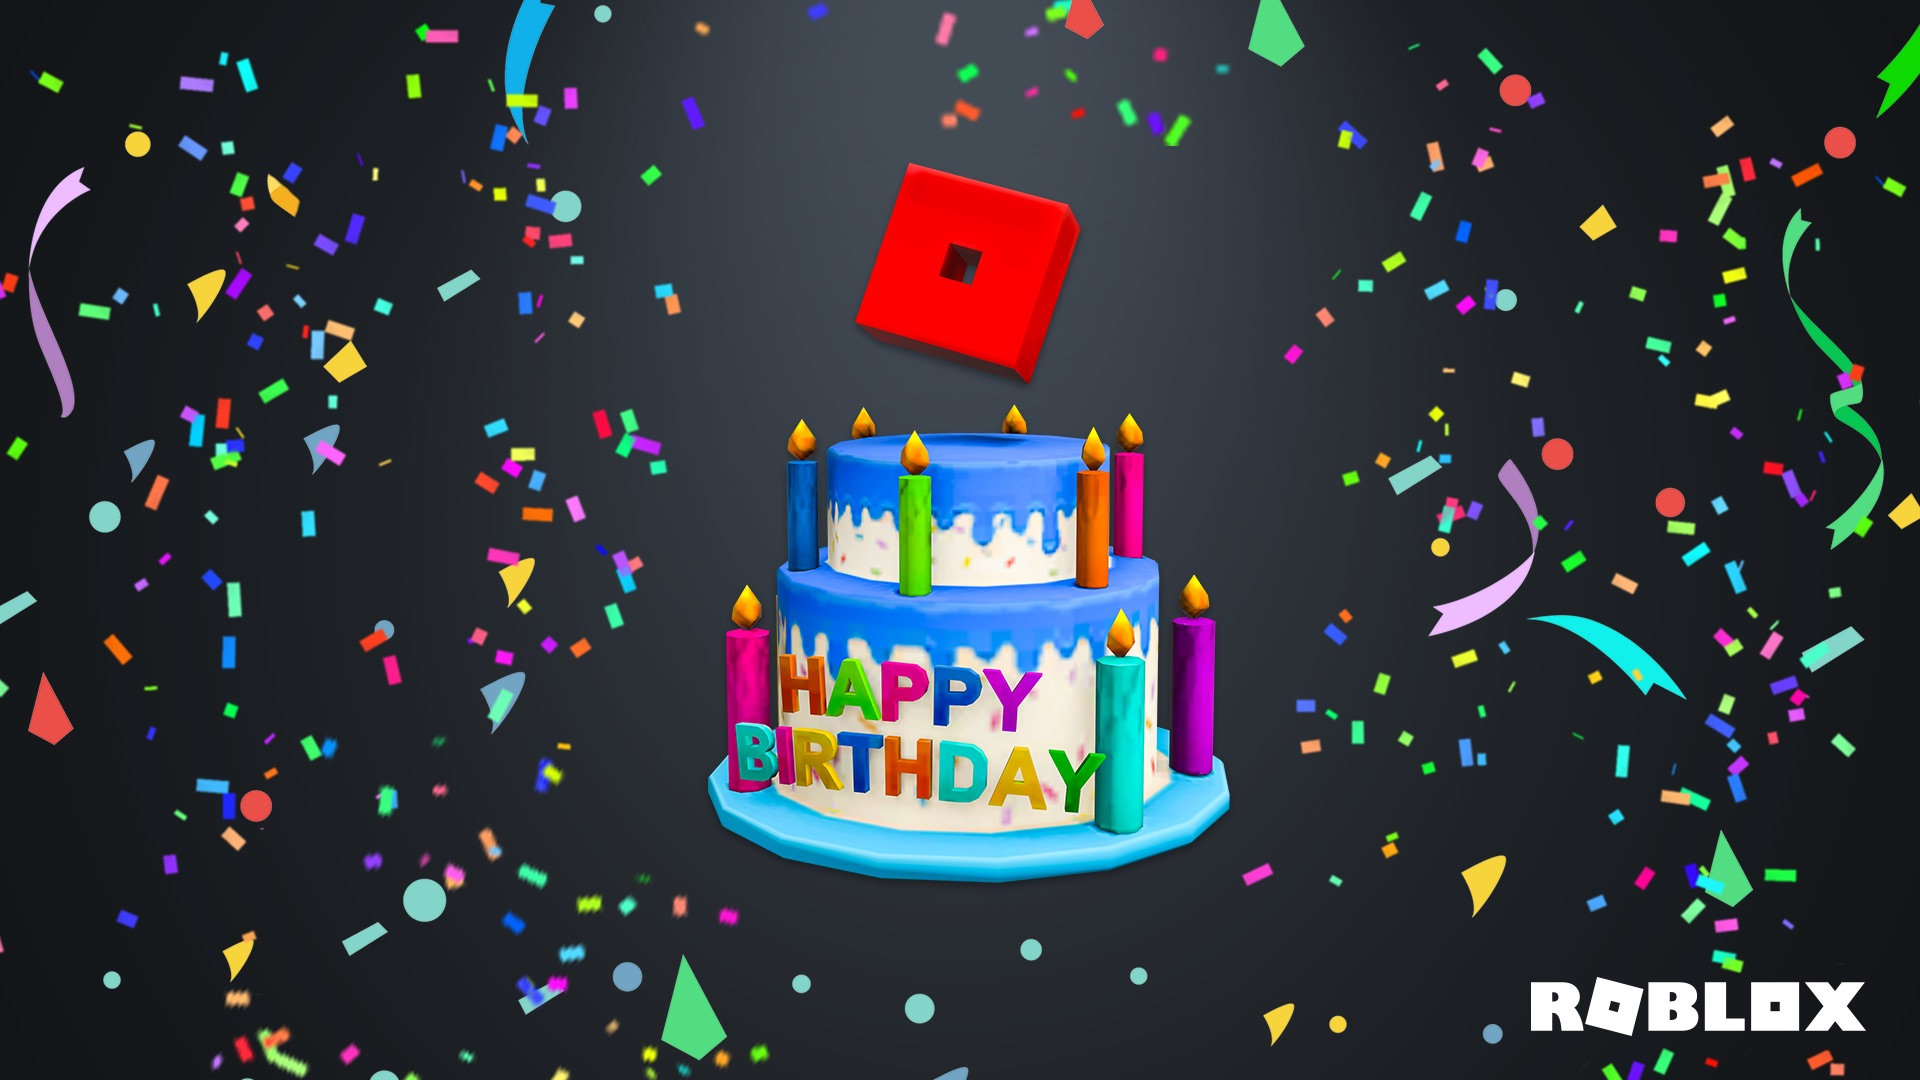 12 birthday cake twelve candles clipart svg free Happy 12th Birthday, Roblox! - Roblox Blog svg free